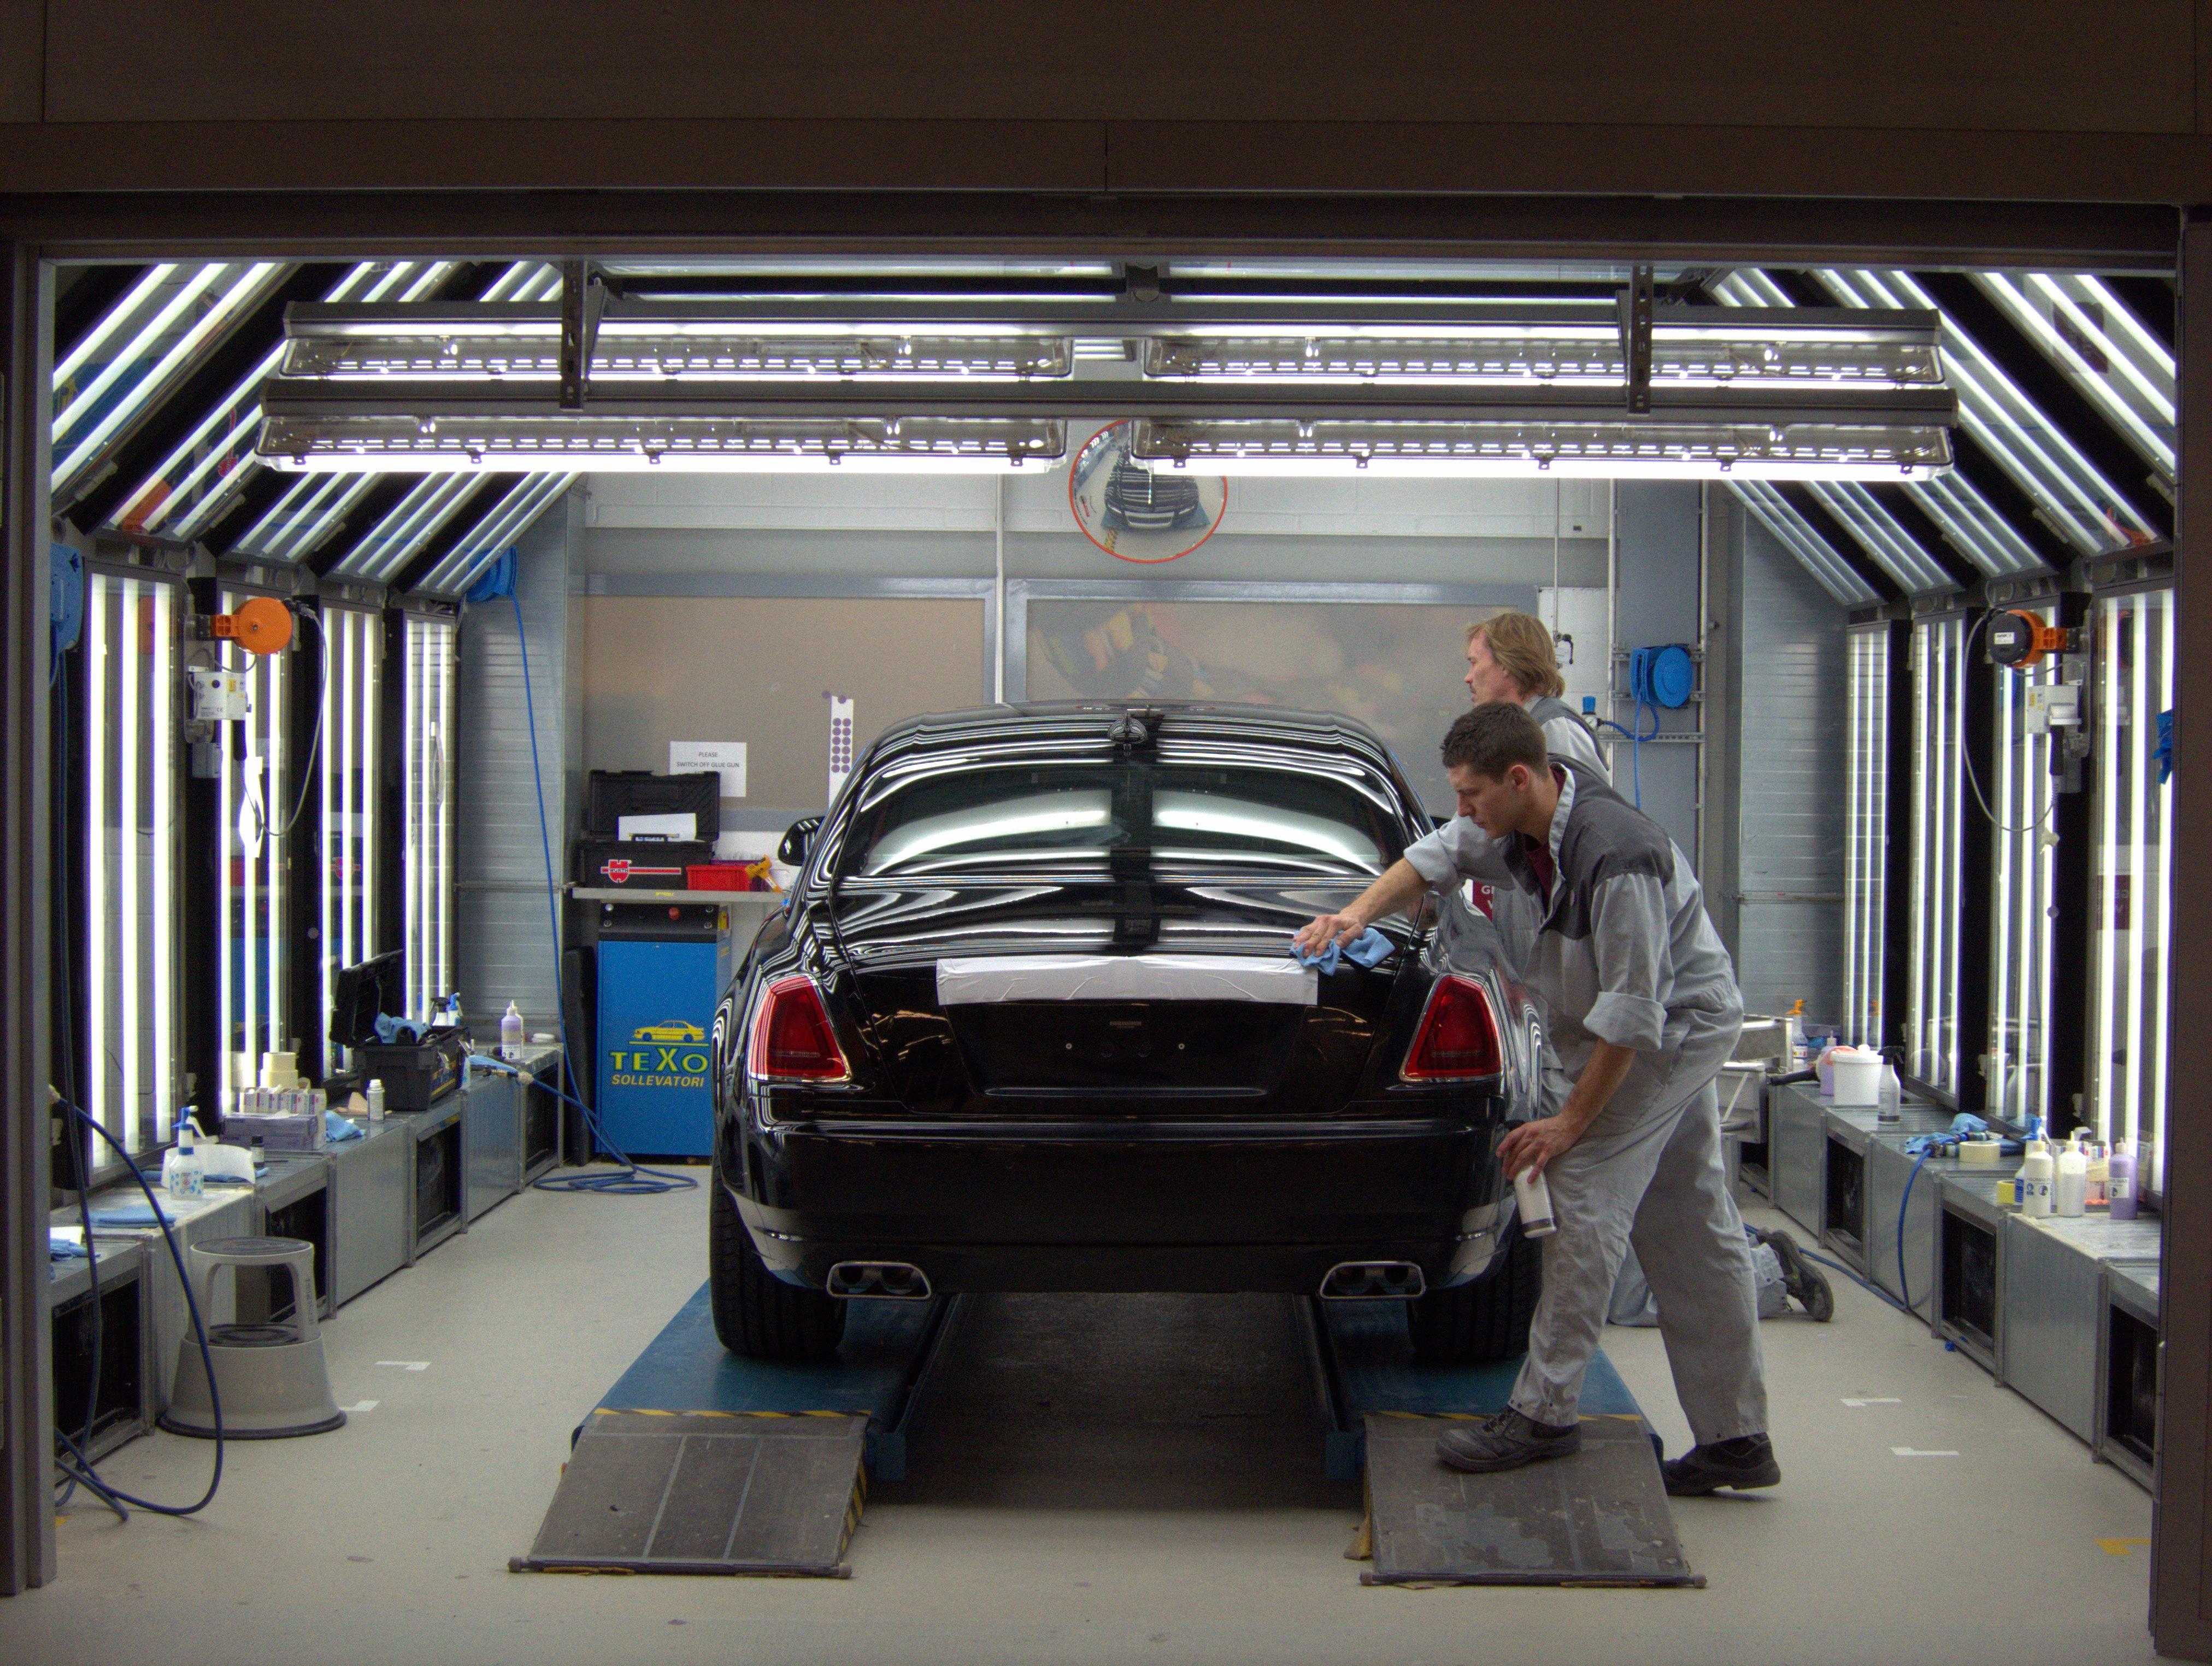 Inside the Rolls-Royce factory in Goodwood.